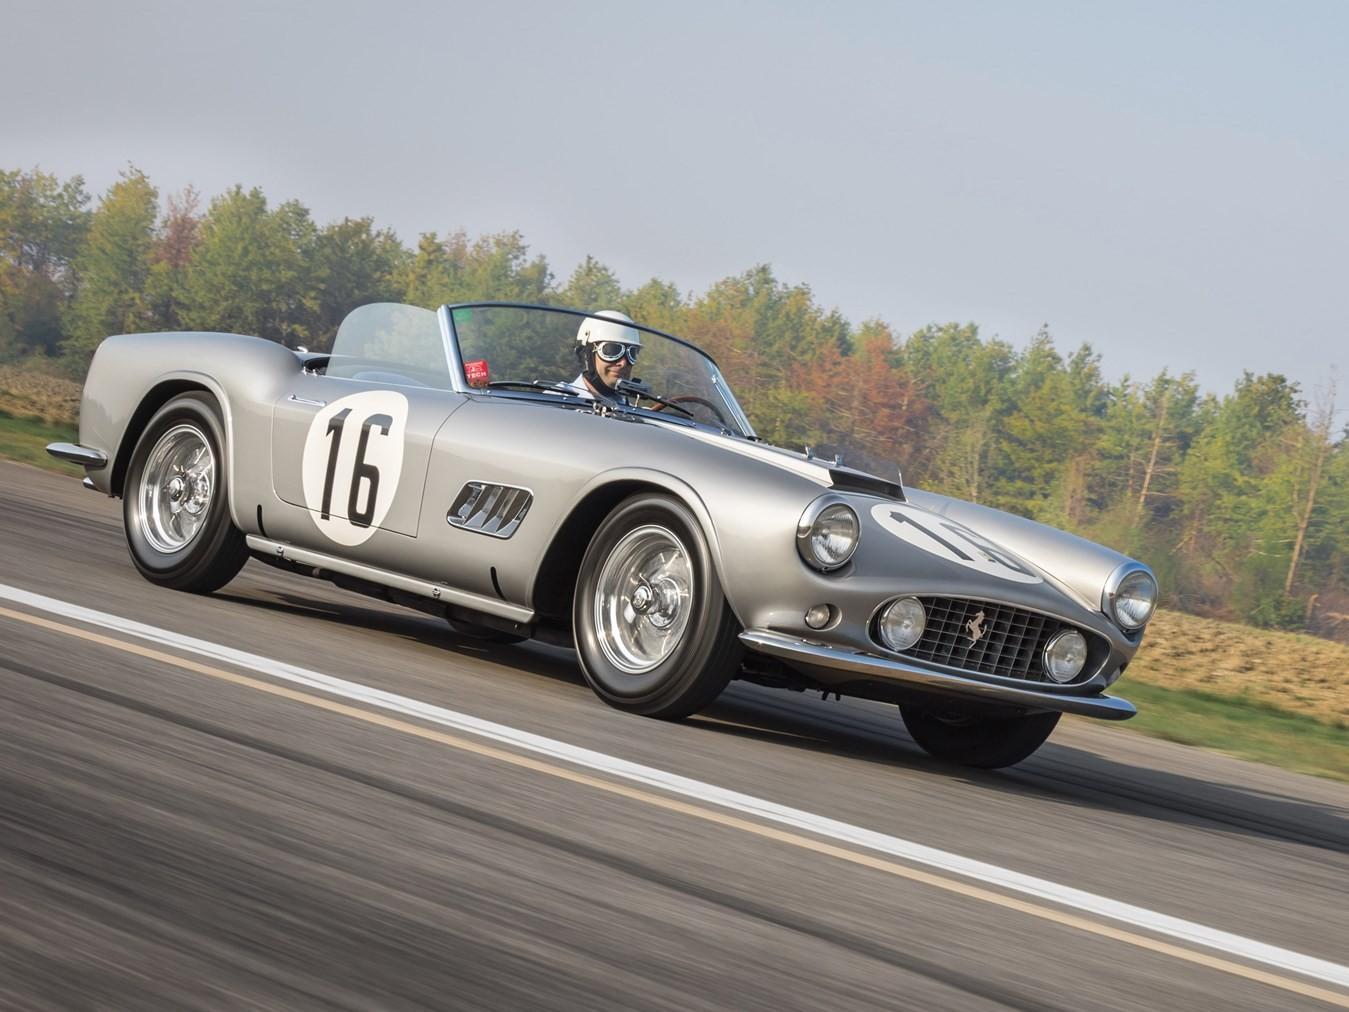 Ferrari FF Gets Four Doors in New Rendering - autoevolution